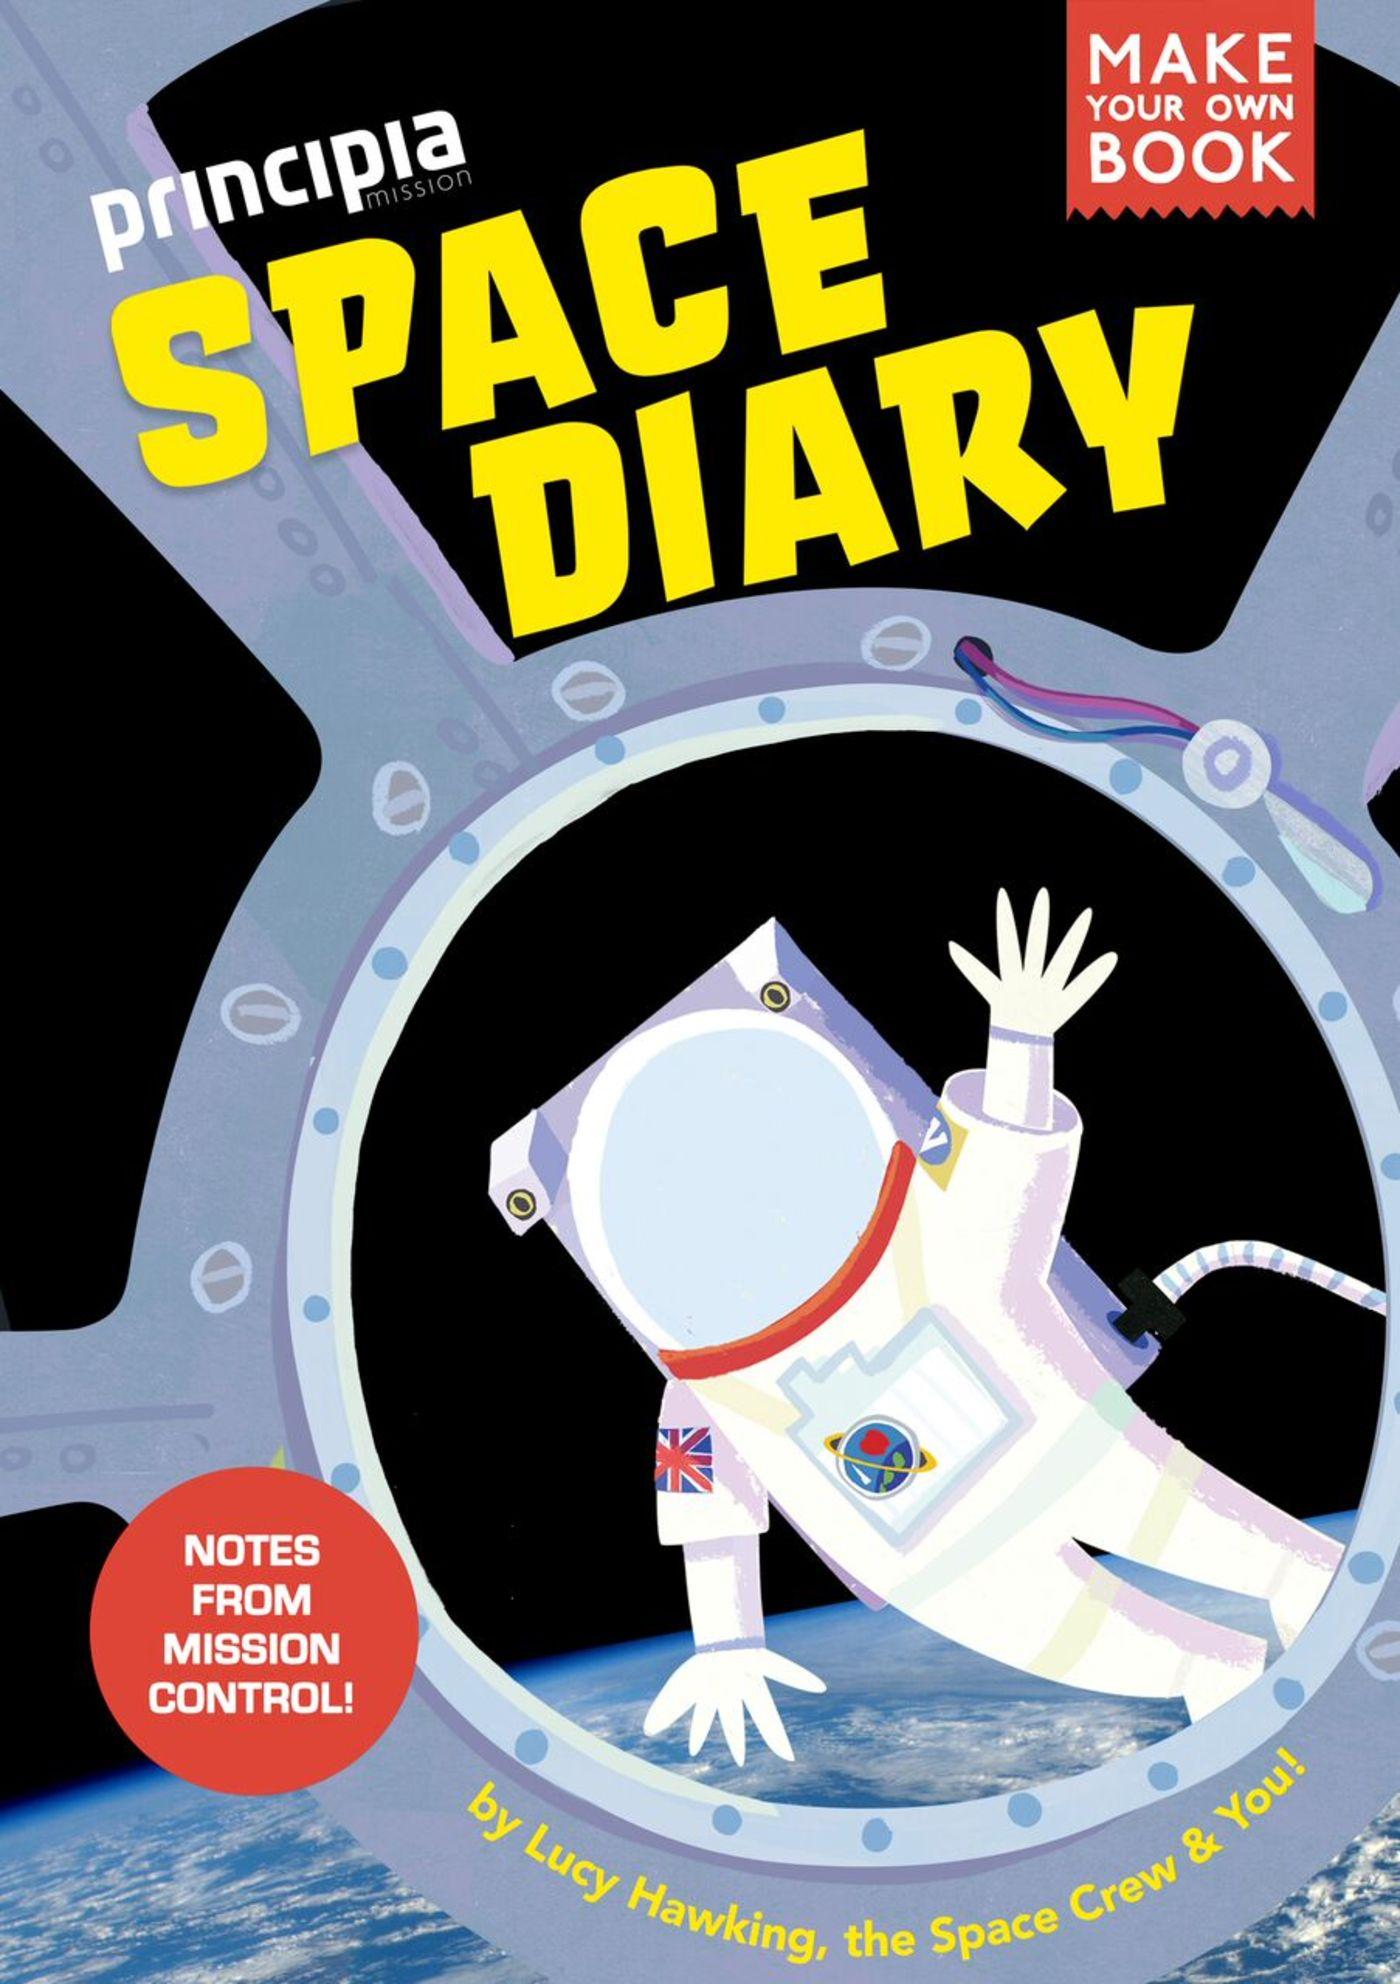 Principia Space Diary